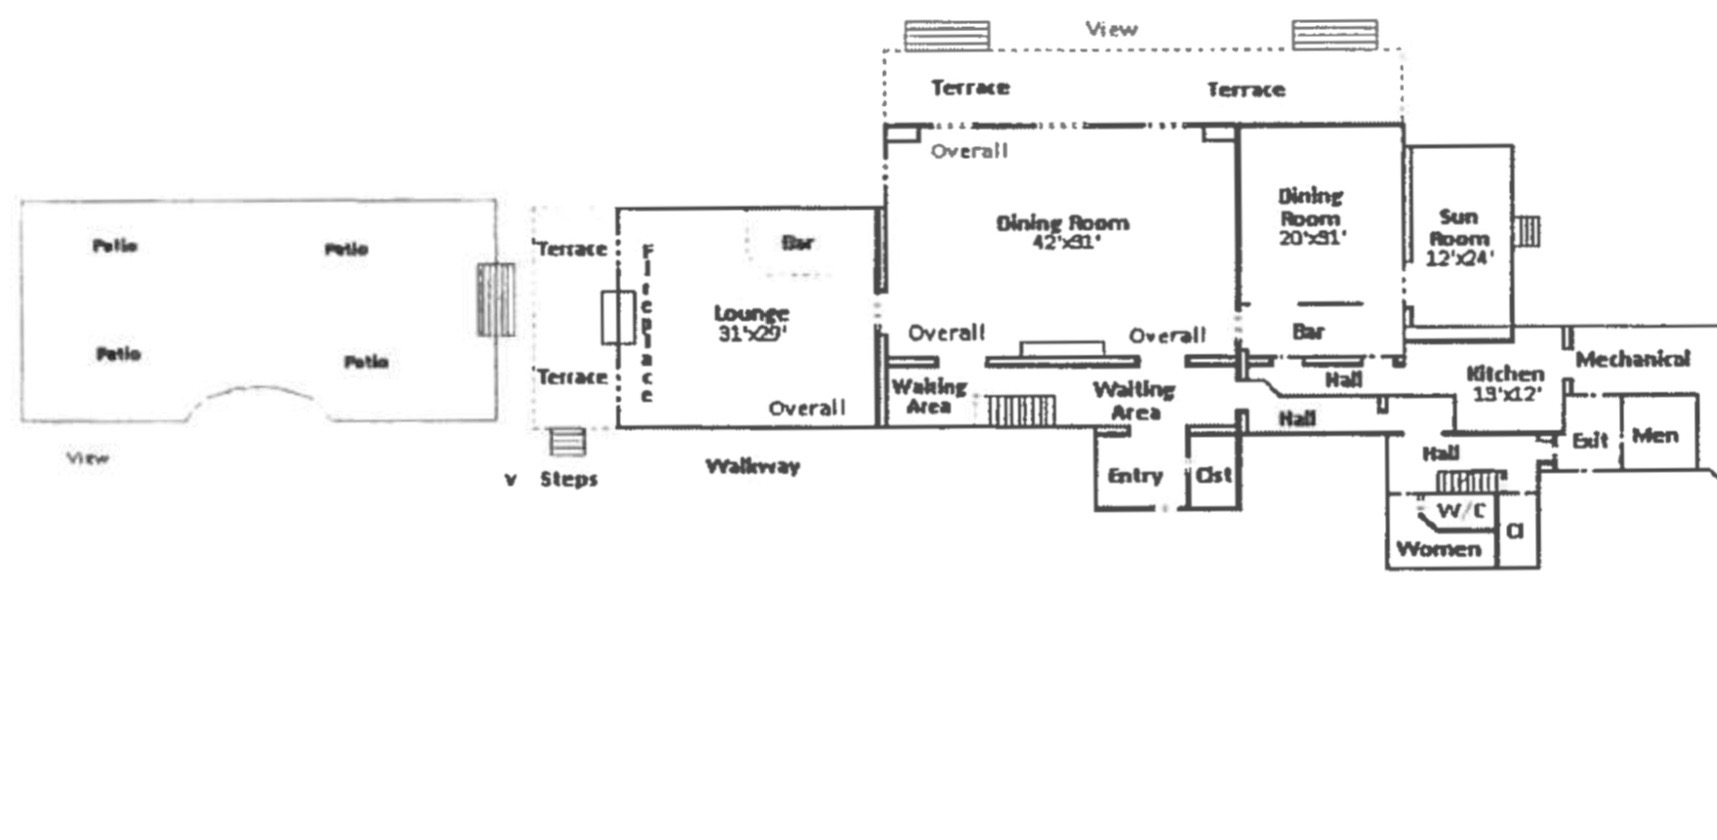 Poplar Springs Floor Plan edited - 1.jpg